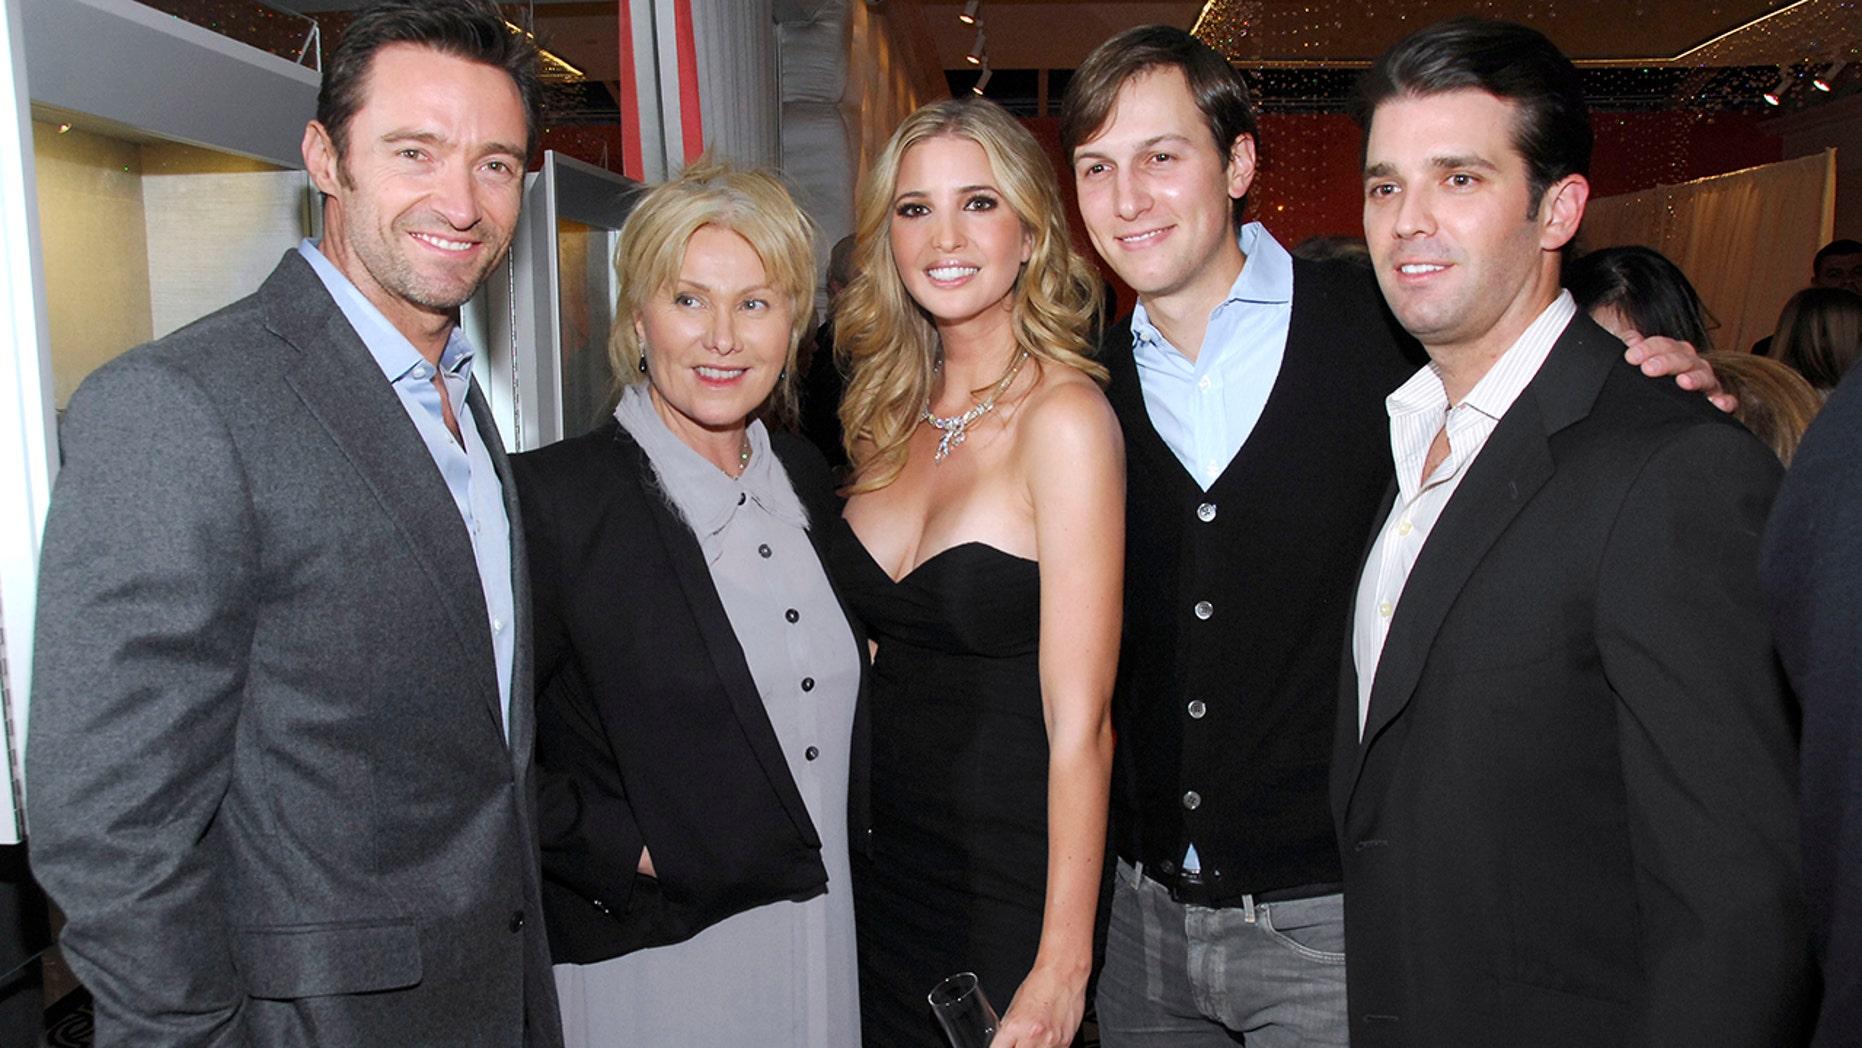 Hugh Jackman, Deborra-Lee Furness, Ivanka Trump, Jared Kushner and Donald Trump Jr. attend Ivanka Trump Fine Jewelry Boutique Opening in New York in 2011.